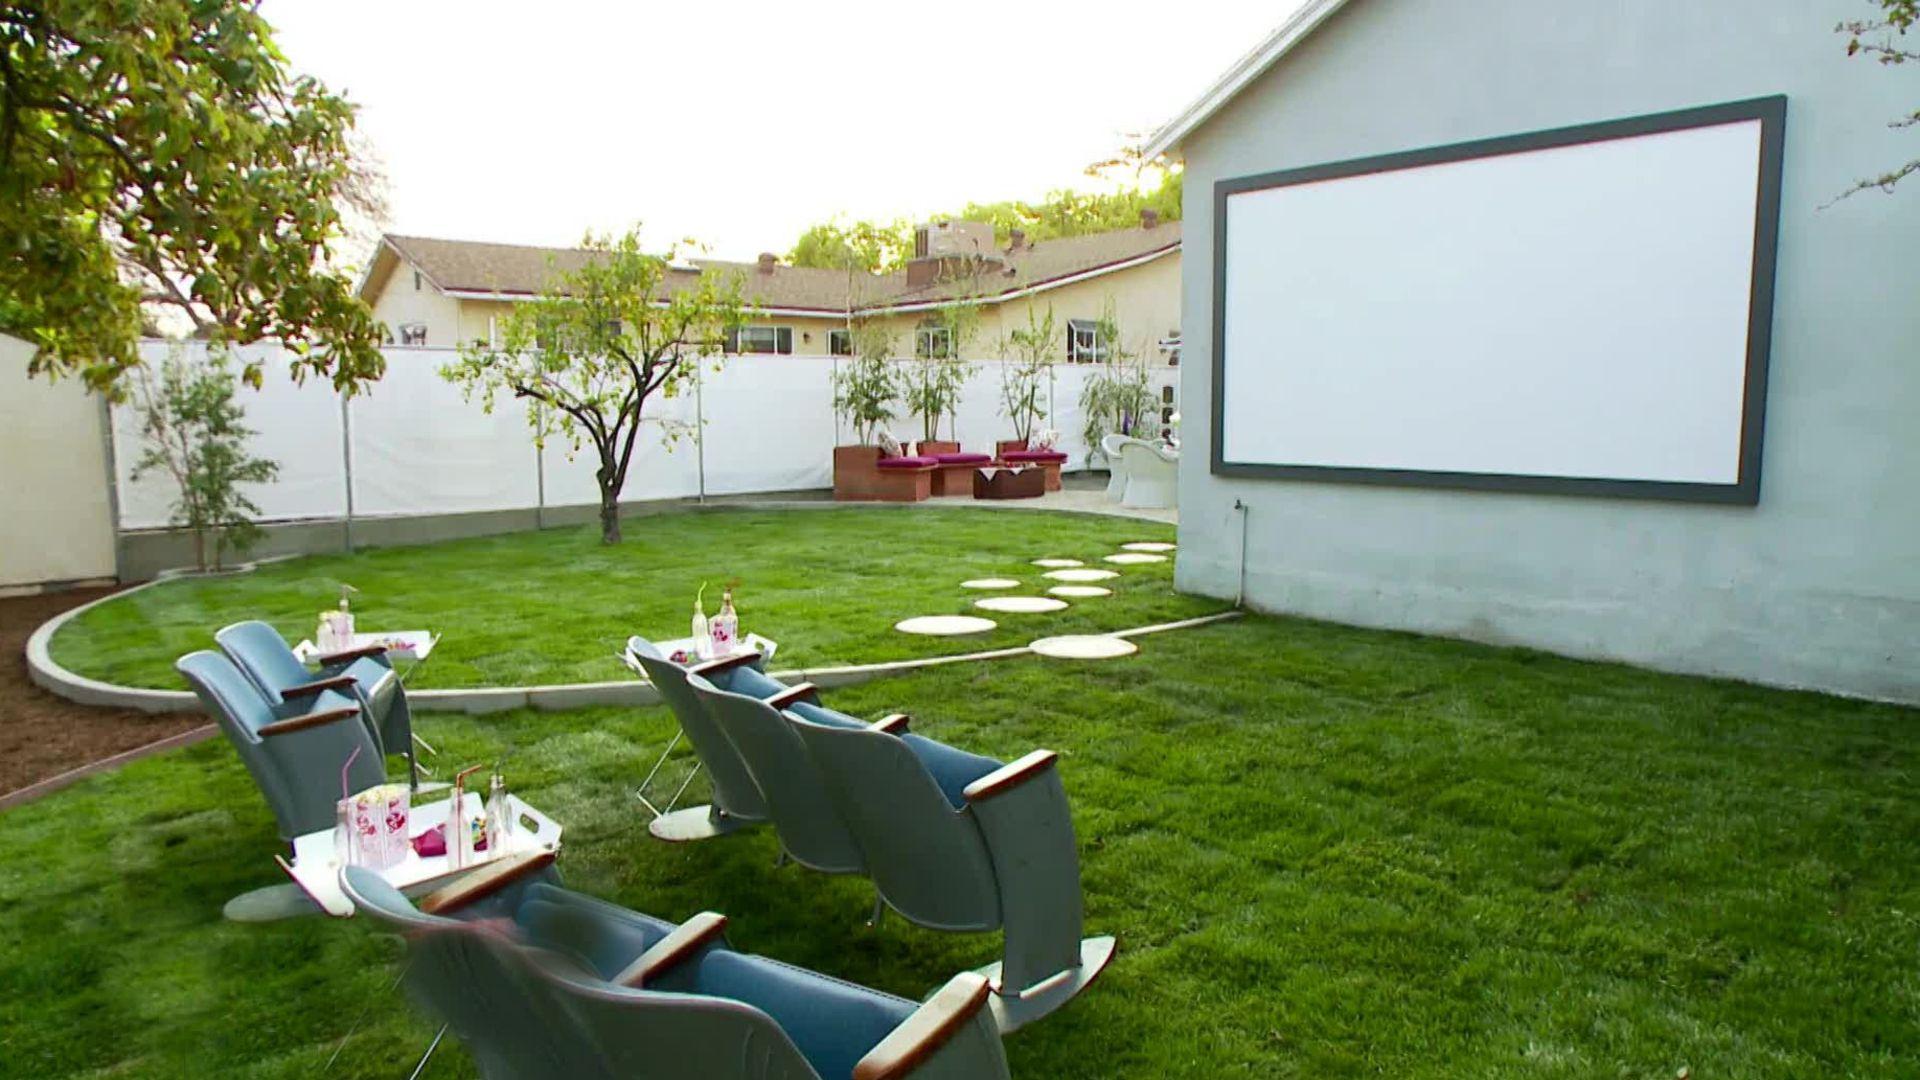 Backyard Theater System best backyard #screen in texas #backyard #theater systems   backyard